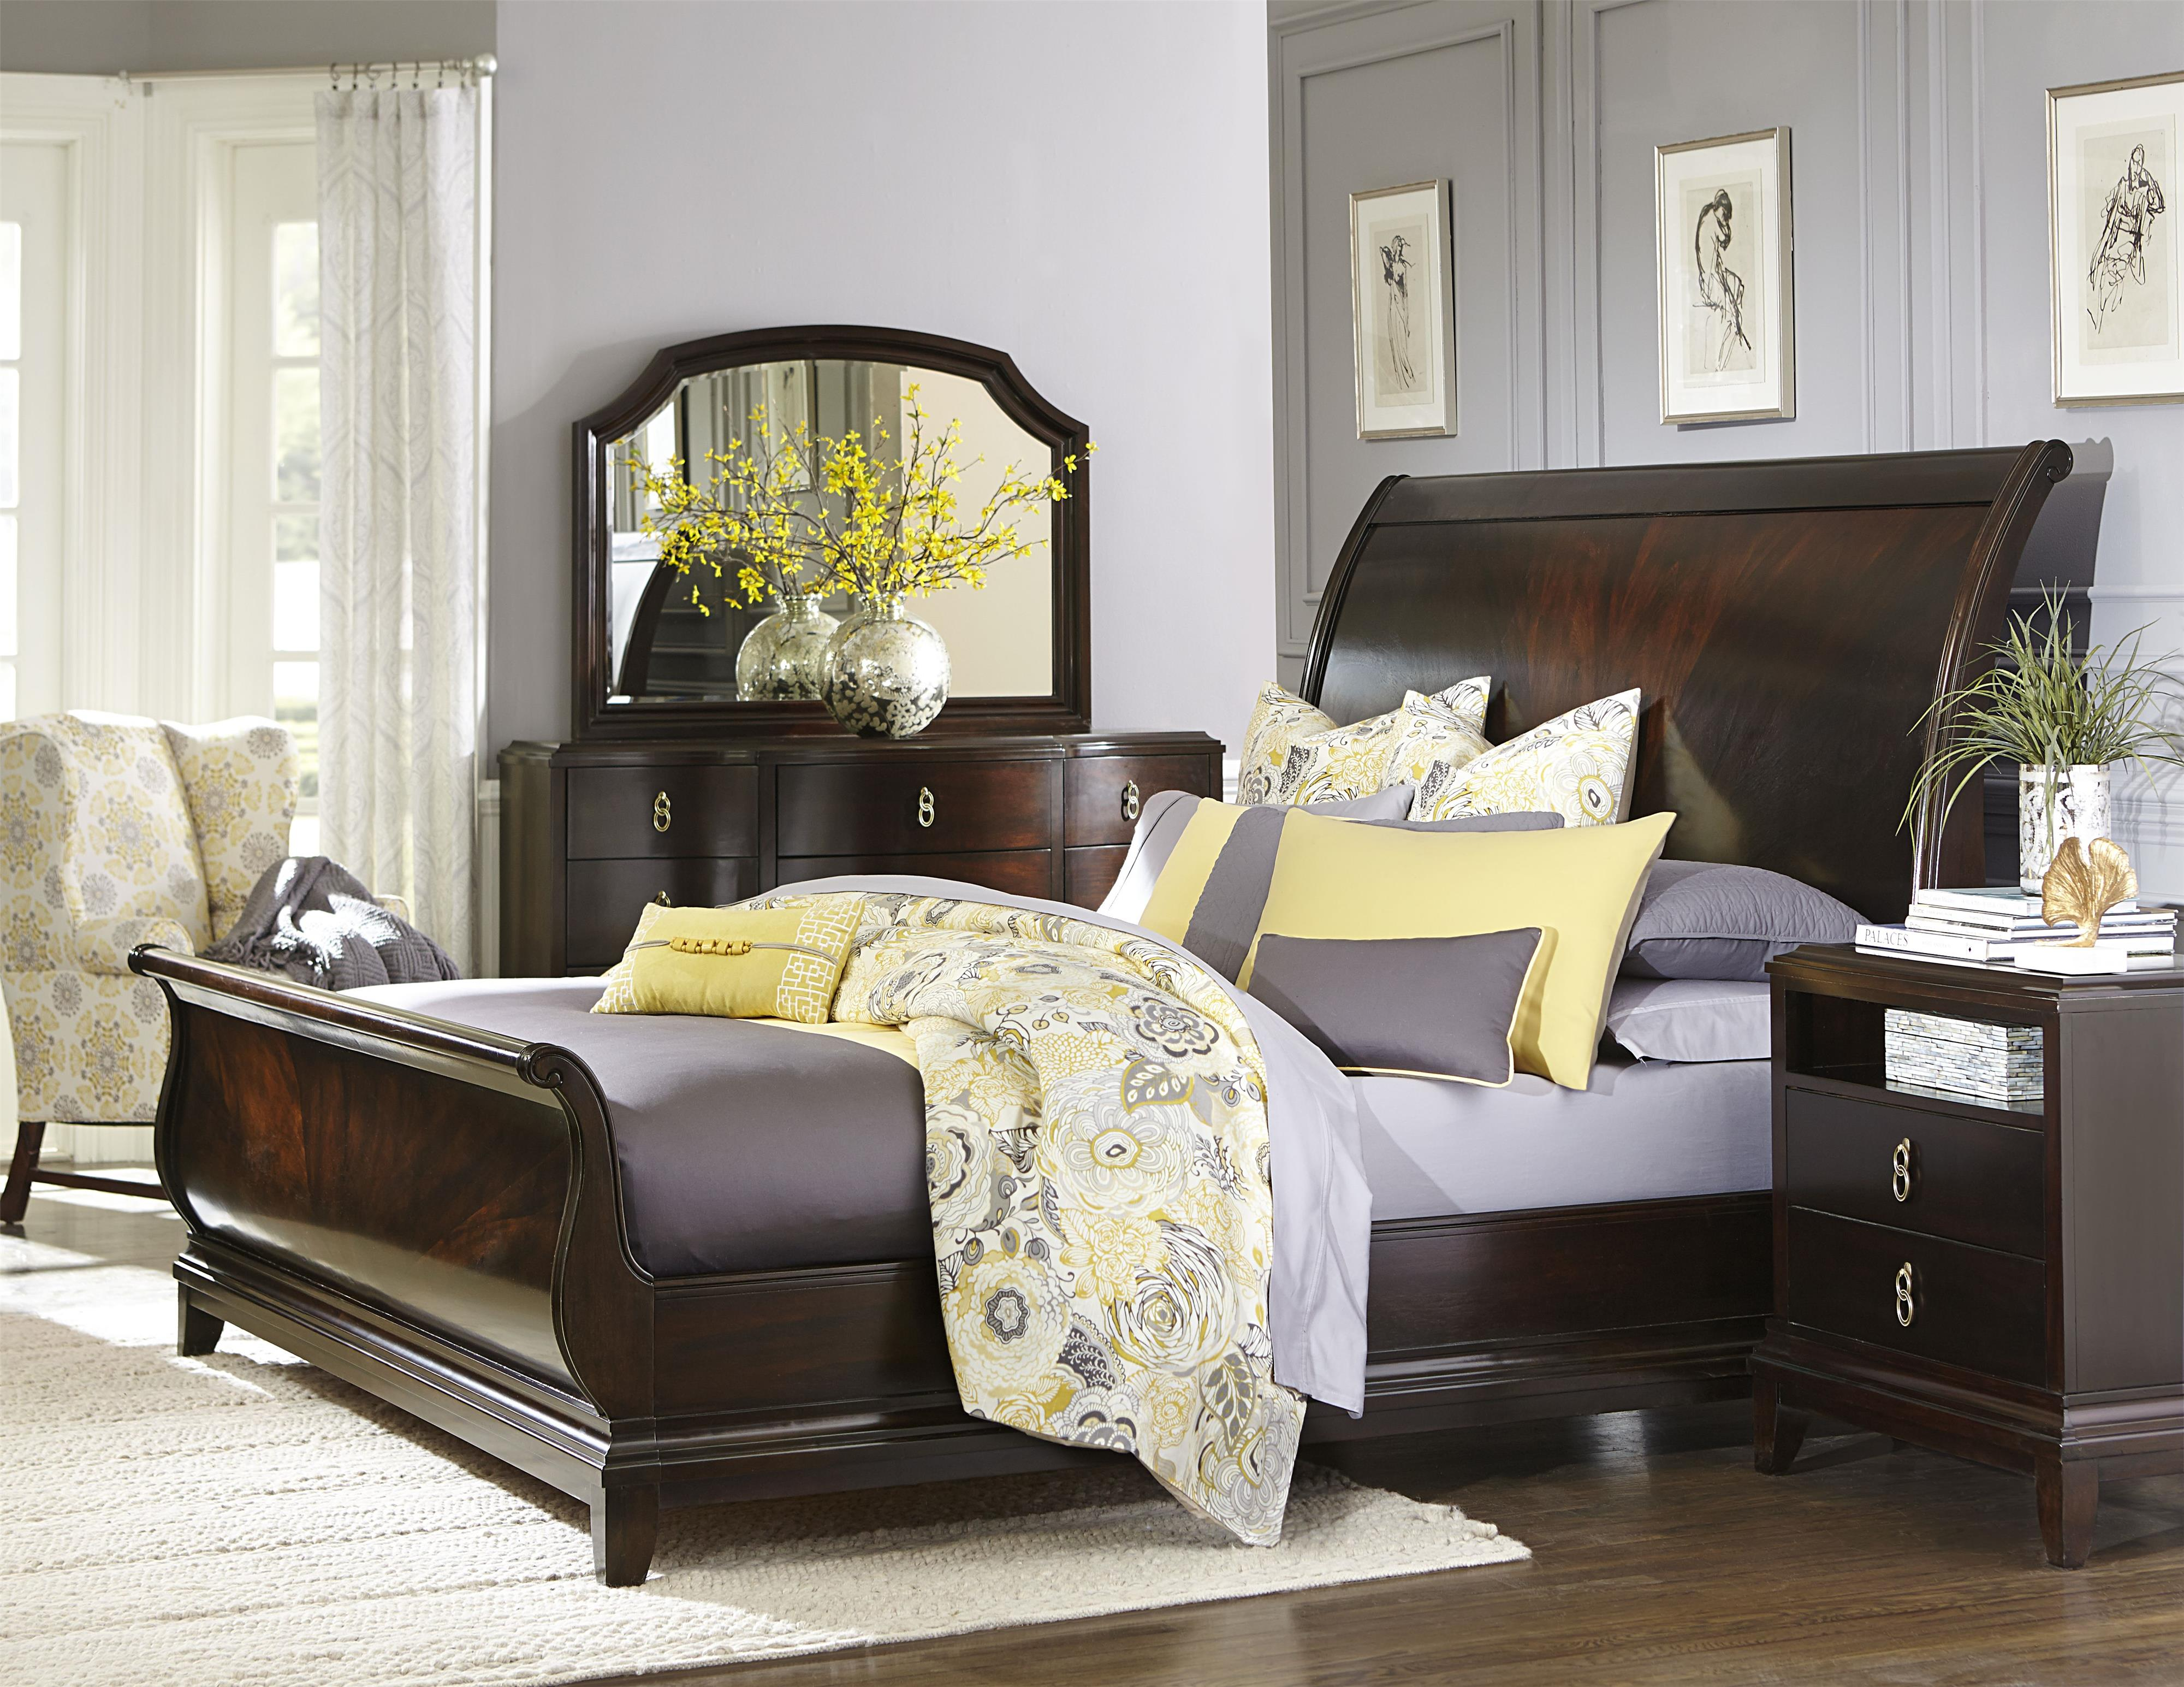 Legacy Classic Sophia Queen Bedroom Group 1 - Item Number: 4450 Q Bedroom Group 1